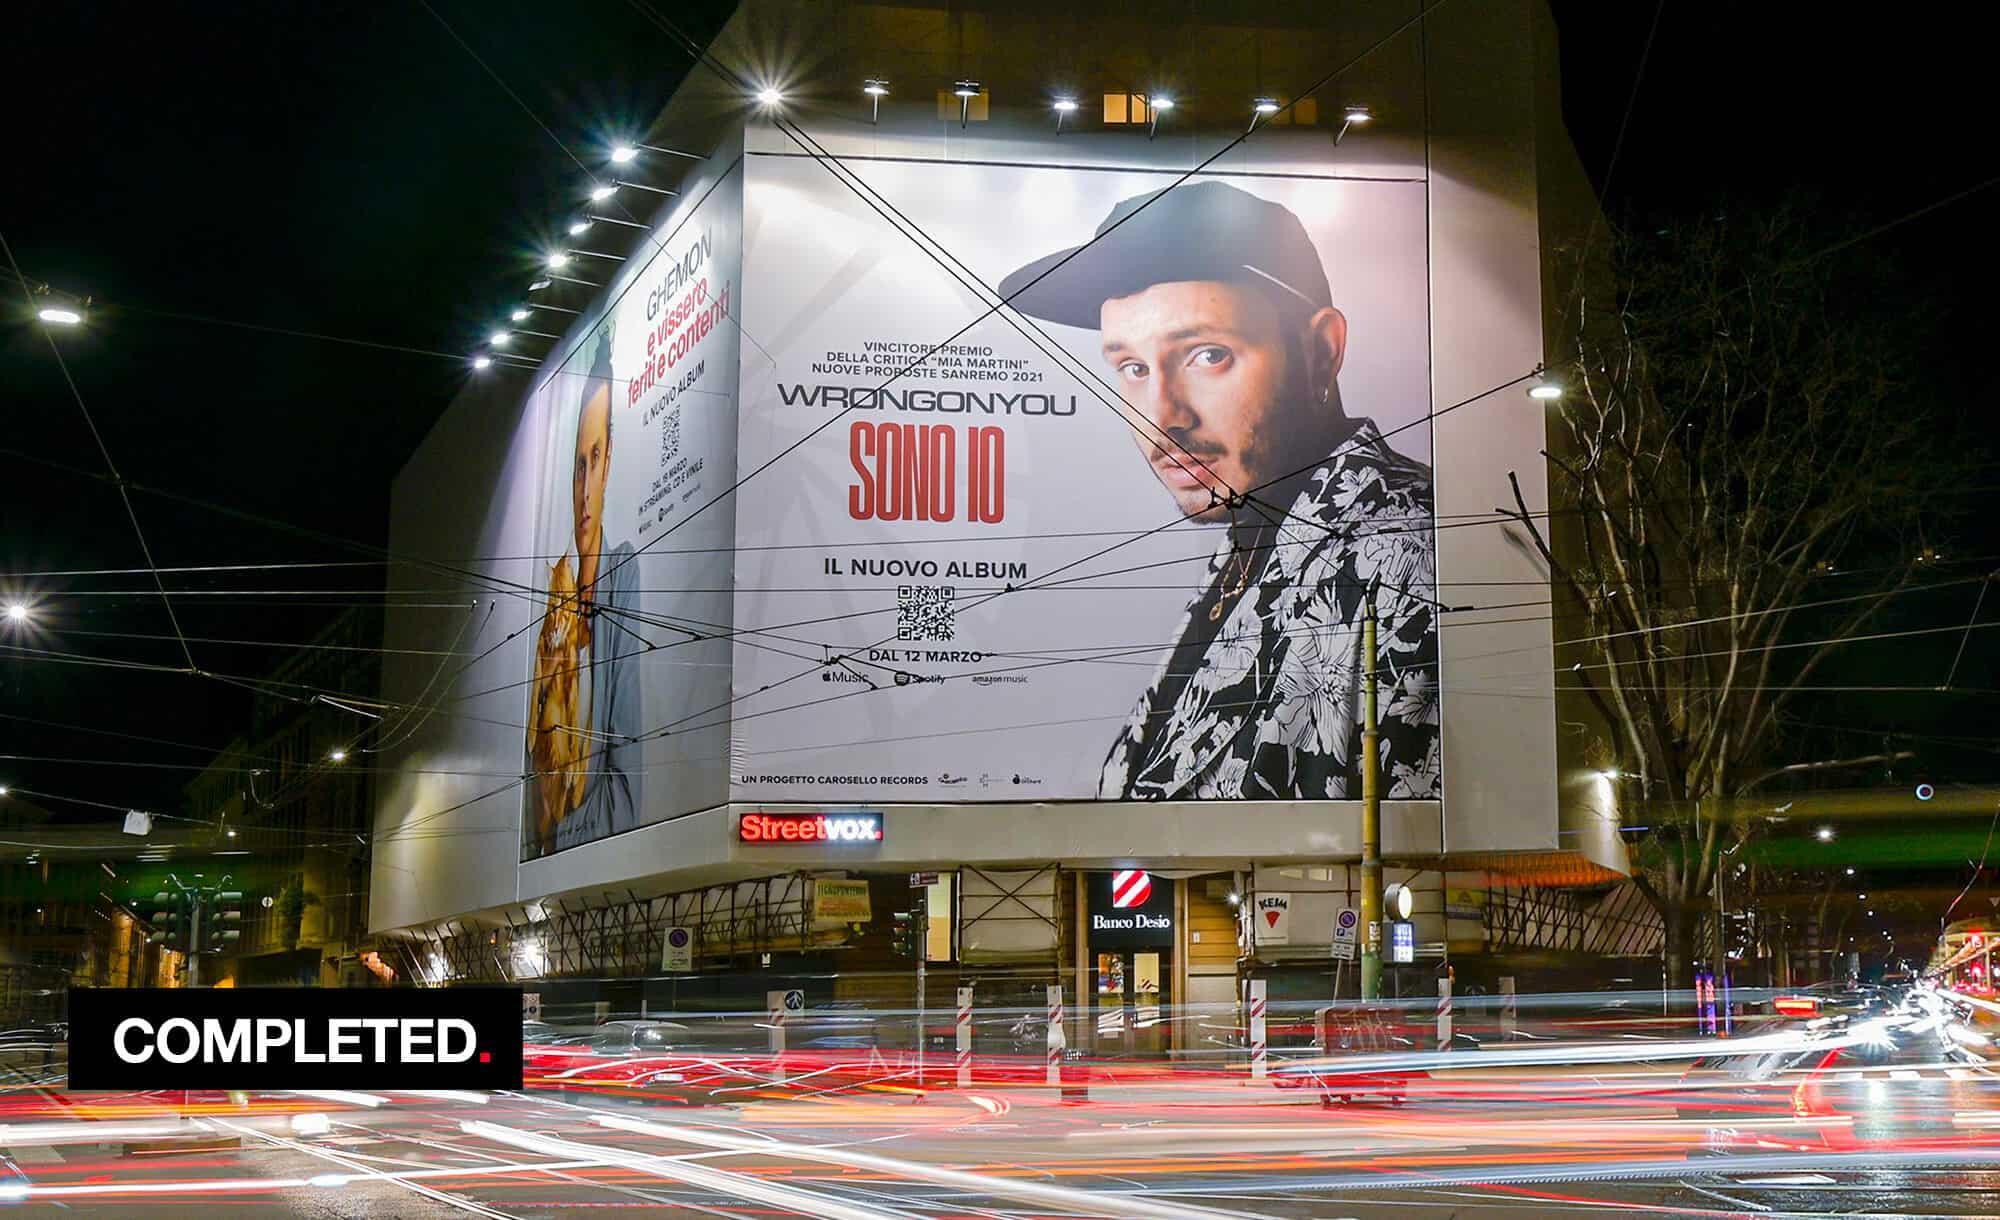 Maxi Affissione a Milano in Corso Magenta 42 con Carosello Records Ghemon e Wrongonyou (Entertainment)